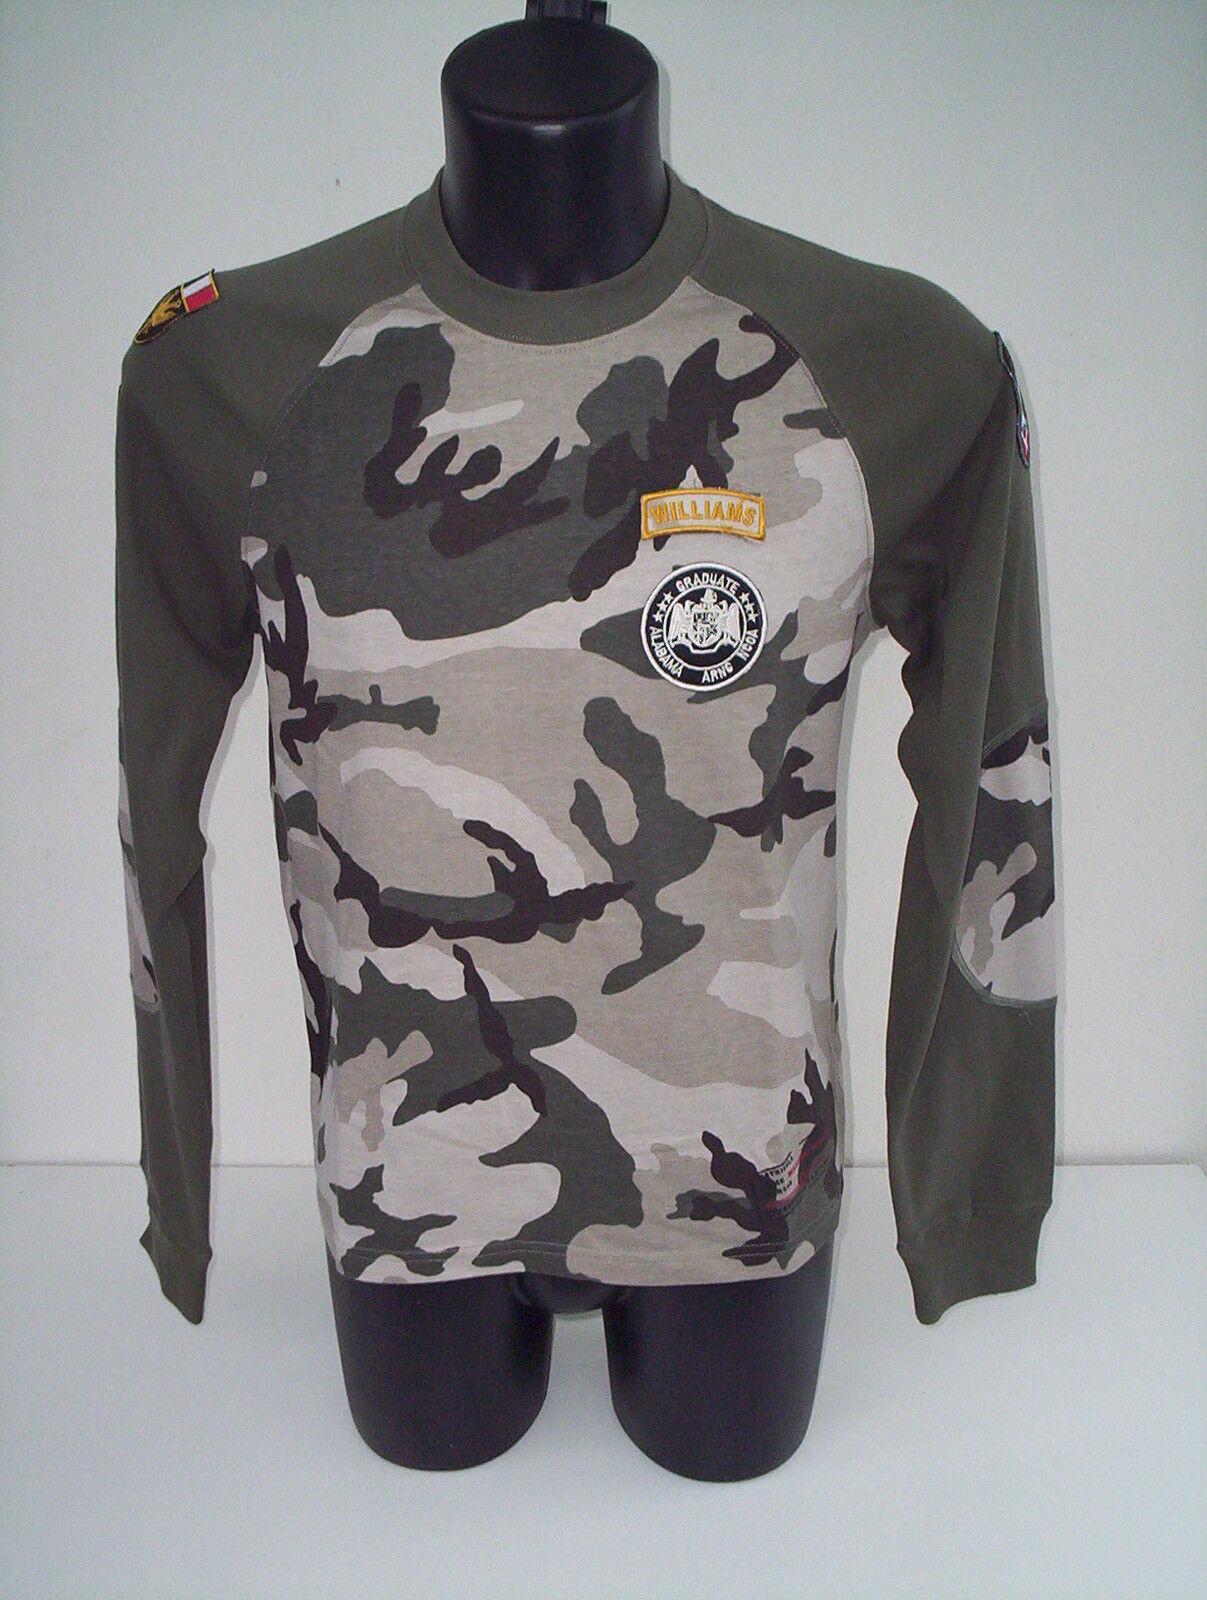 T-shirt   williams wilson , air america ,colore VERDE MILITARE  tg m